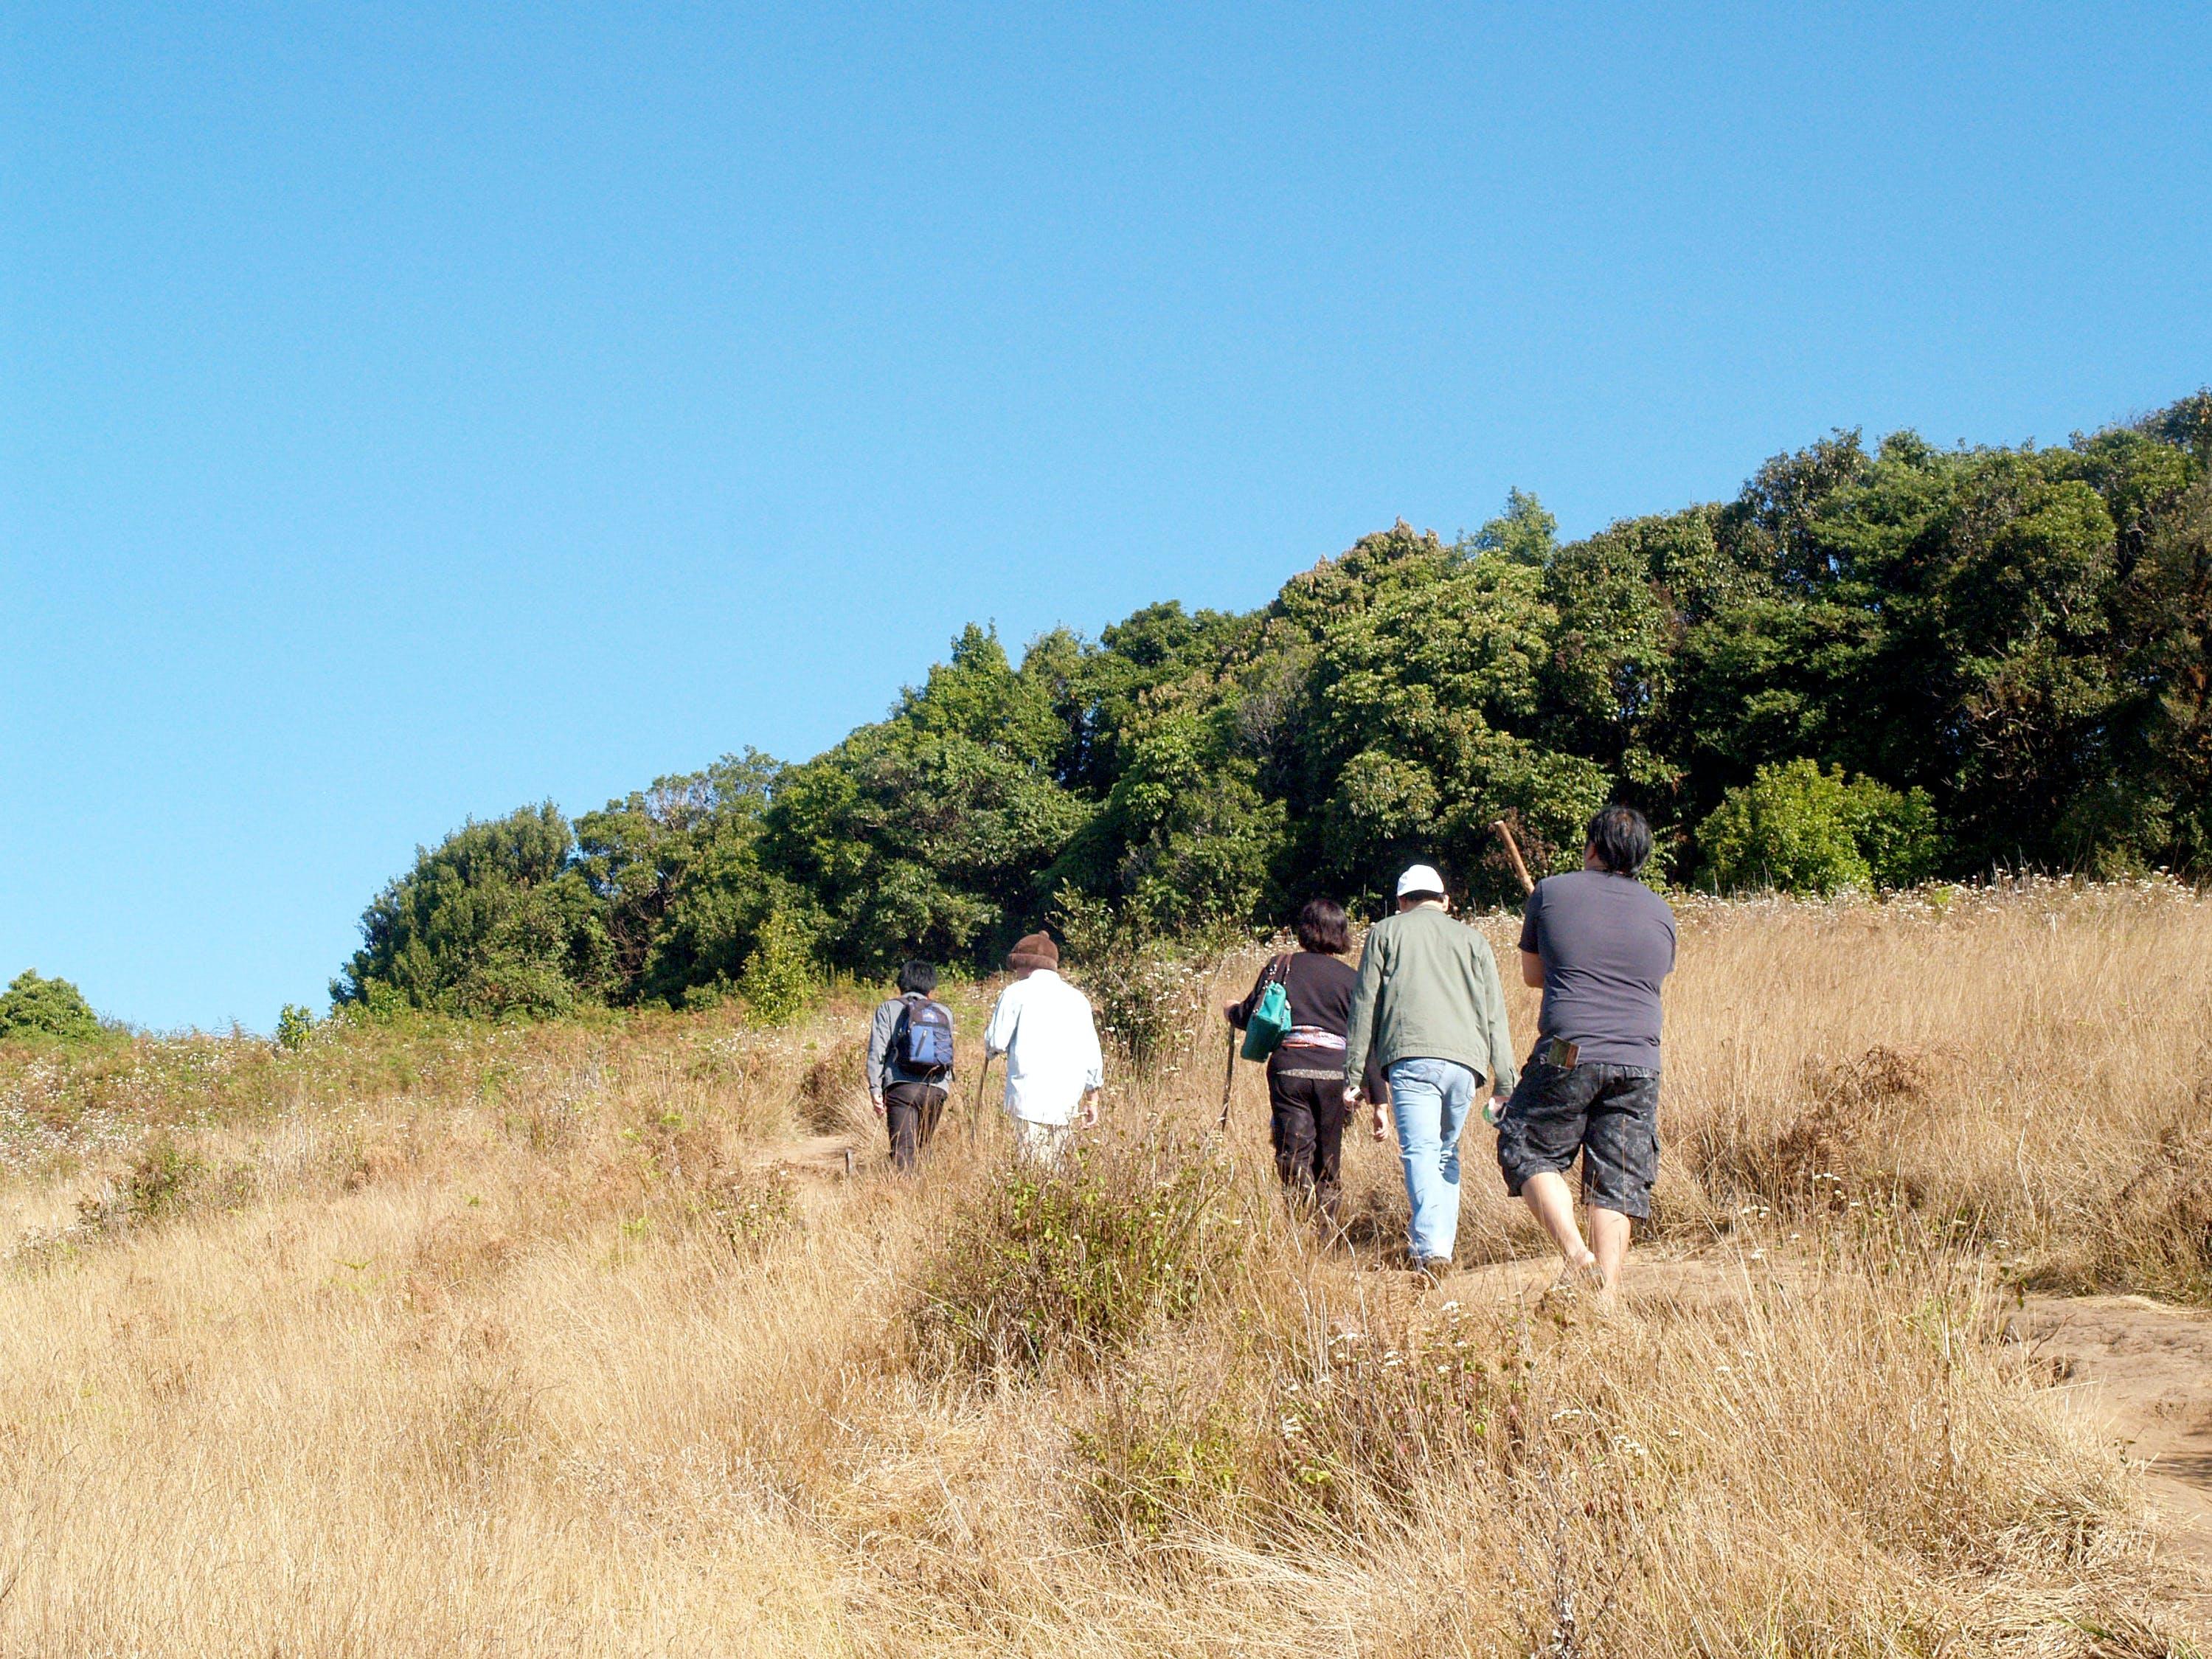 Group of People Walking on Grass Field